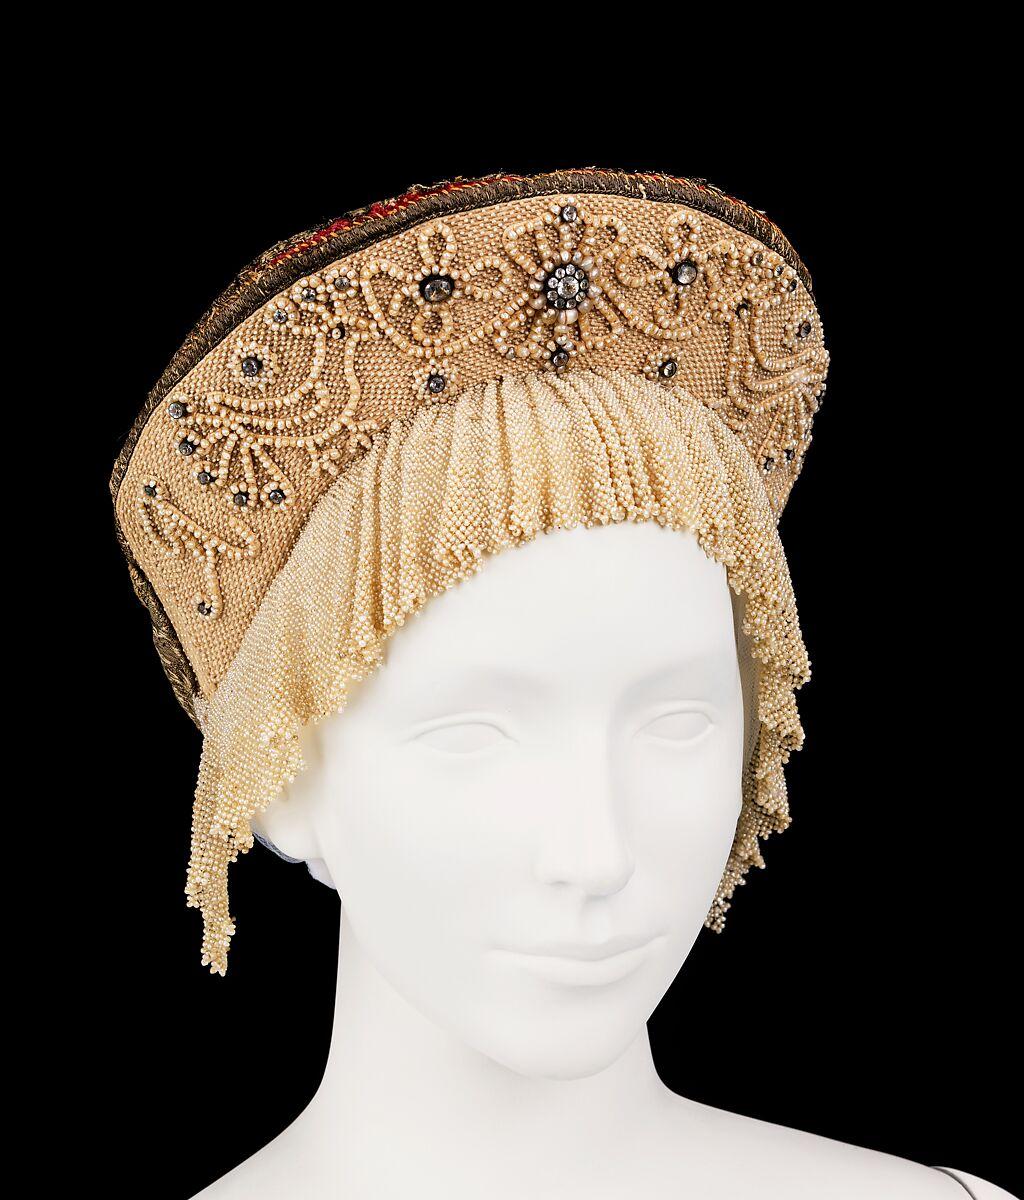 Headdress | Russian | The Met